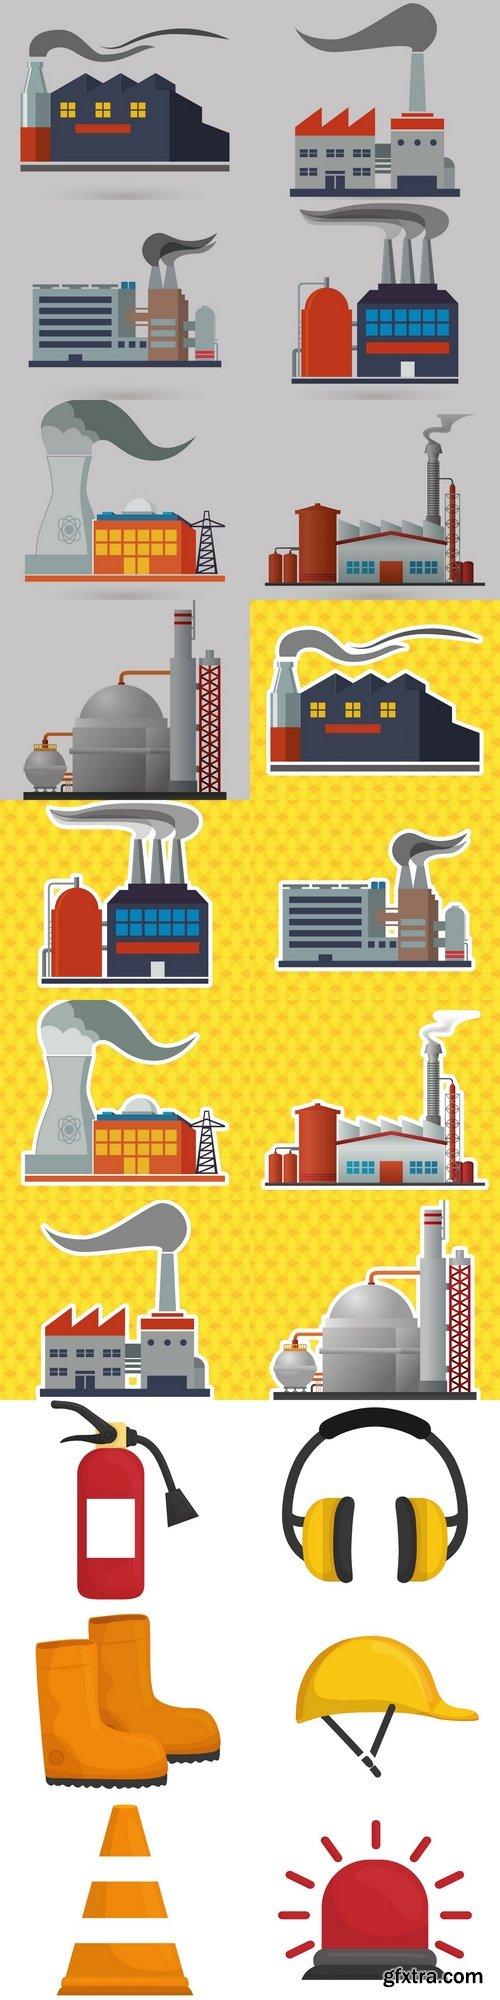 Industrial security design 2